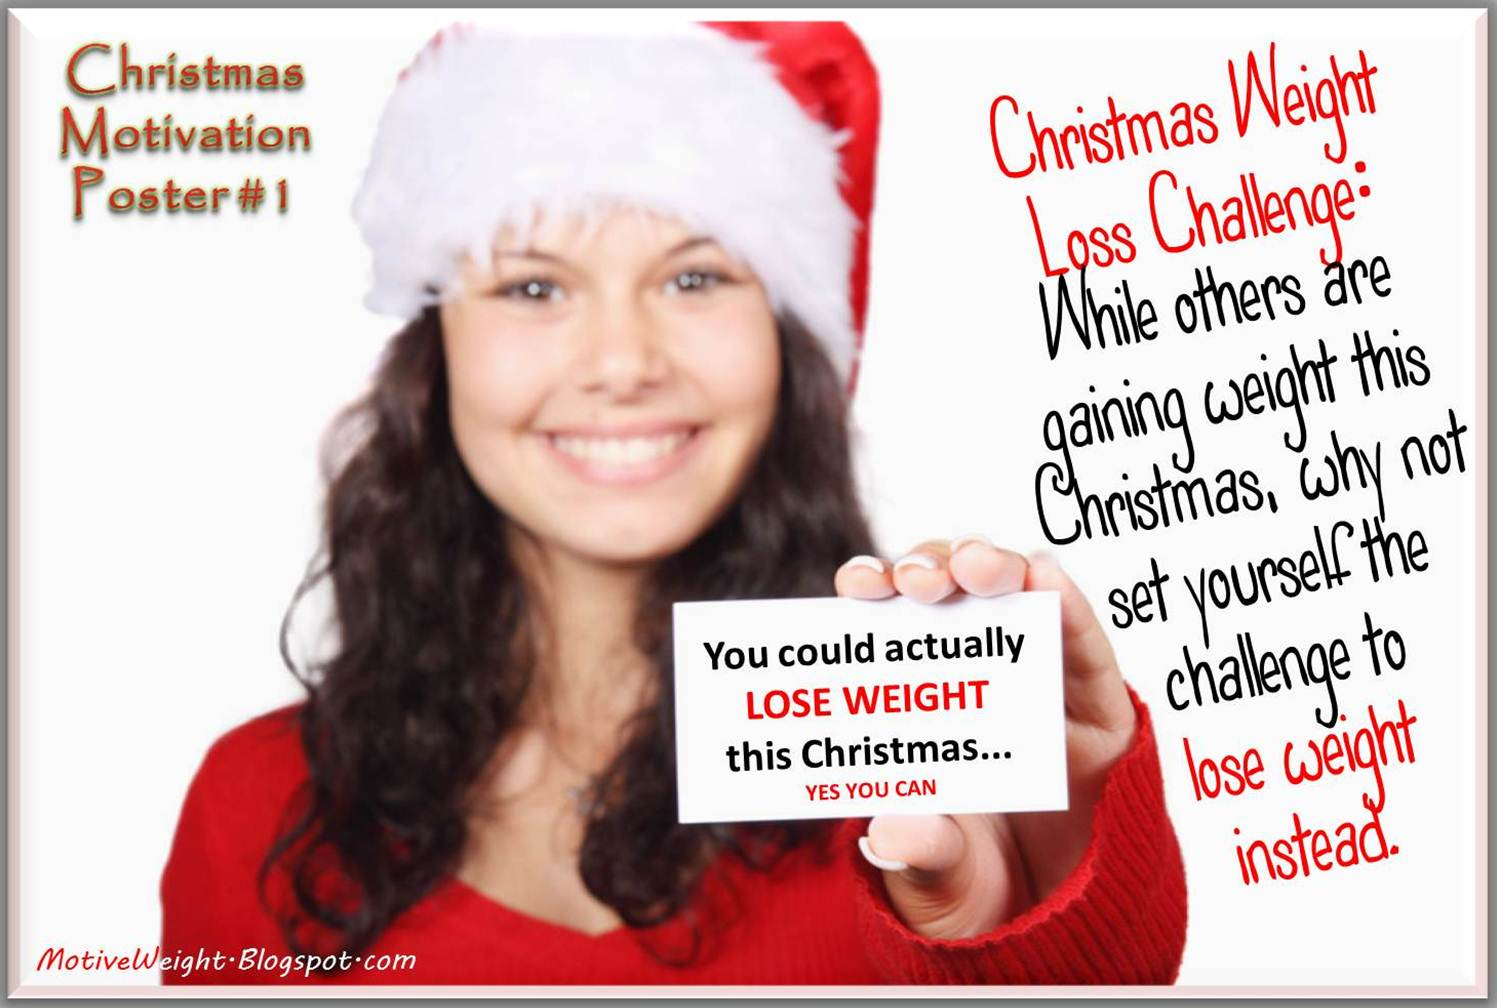 Motiveweight christmas weight loss tip 1 christmas weight loss tip 1 ccuart Image collections